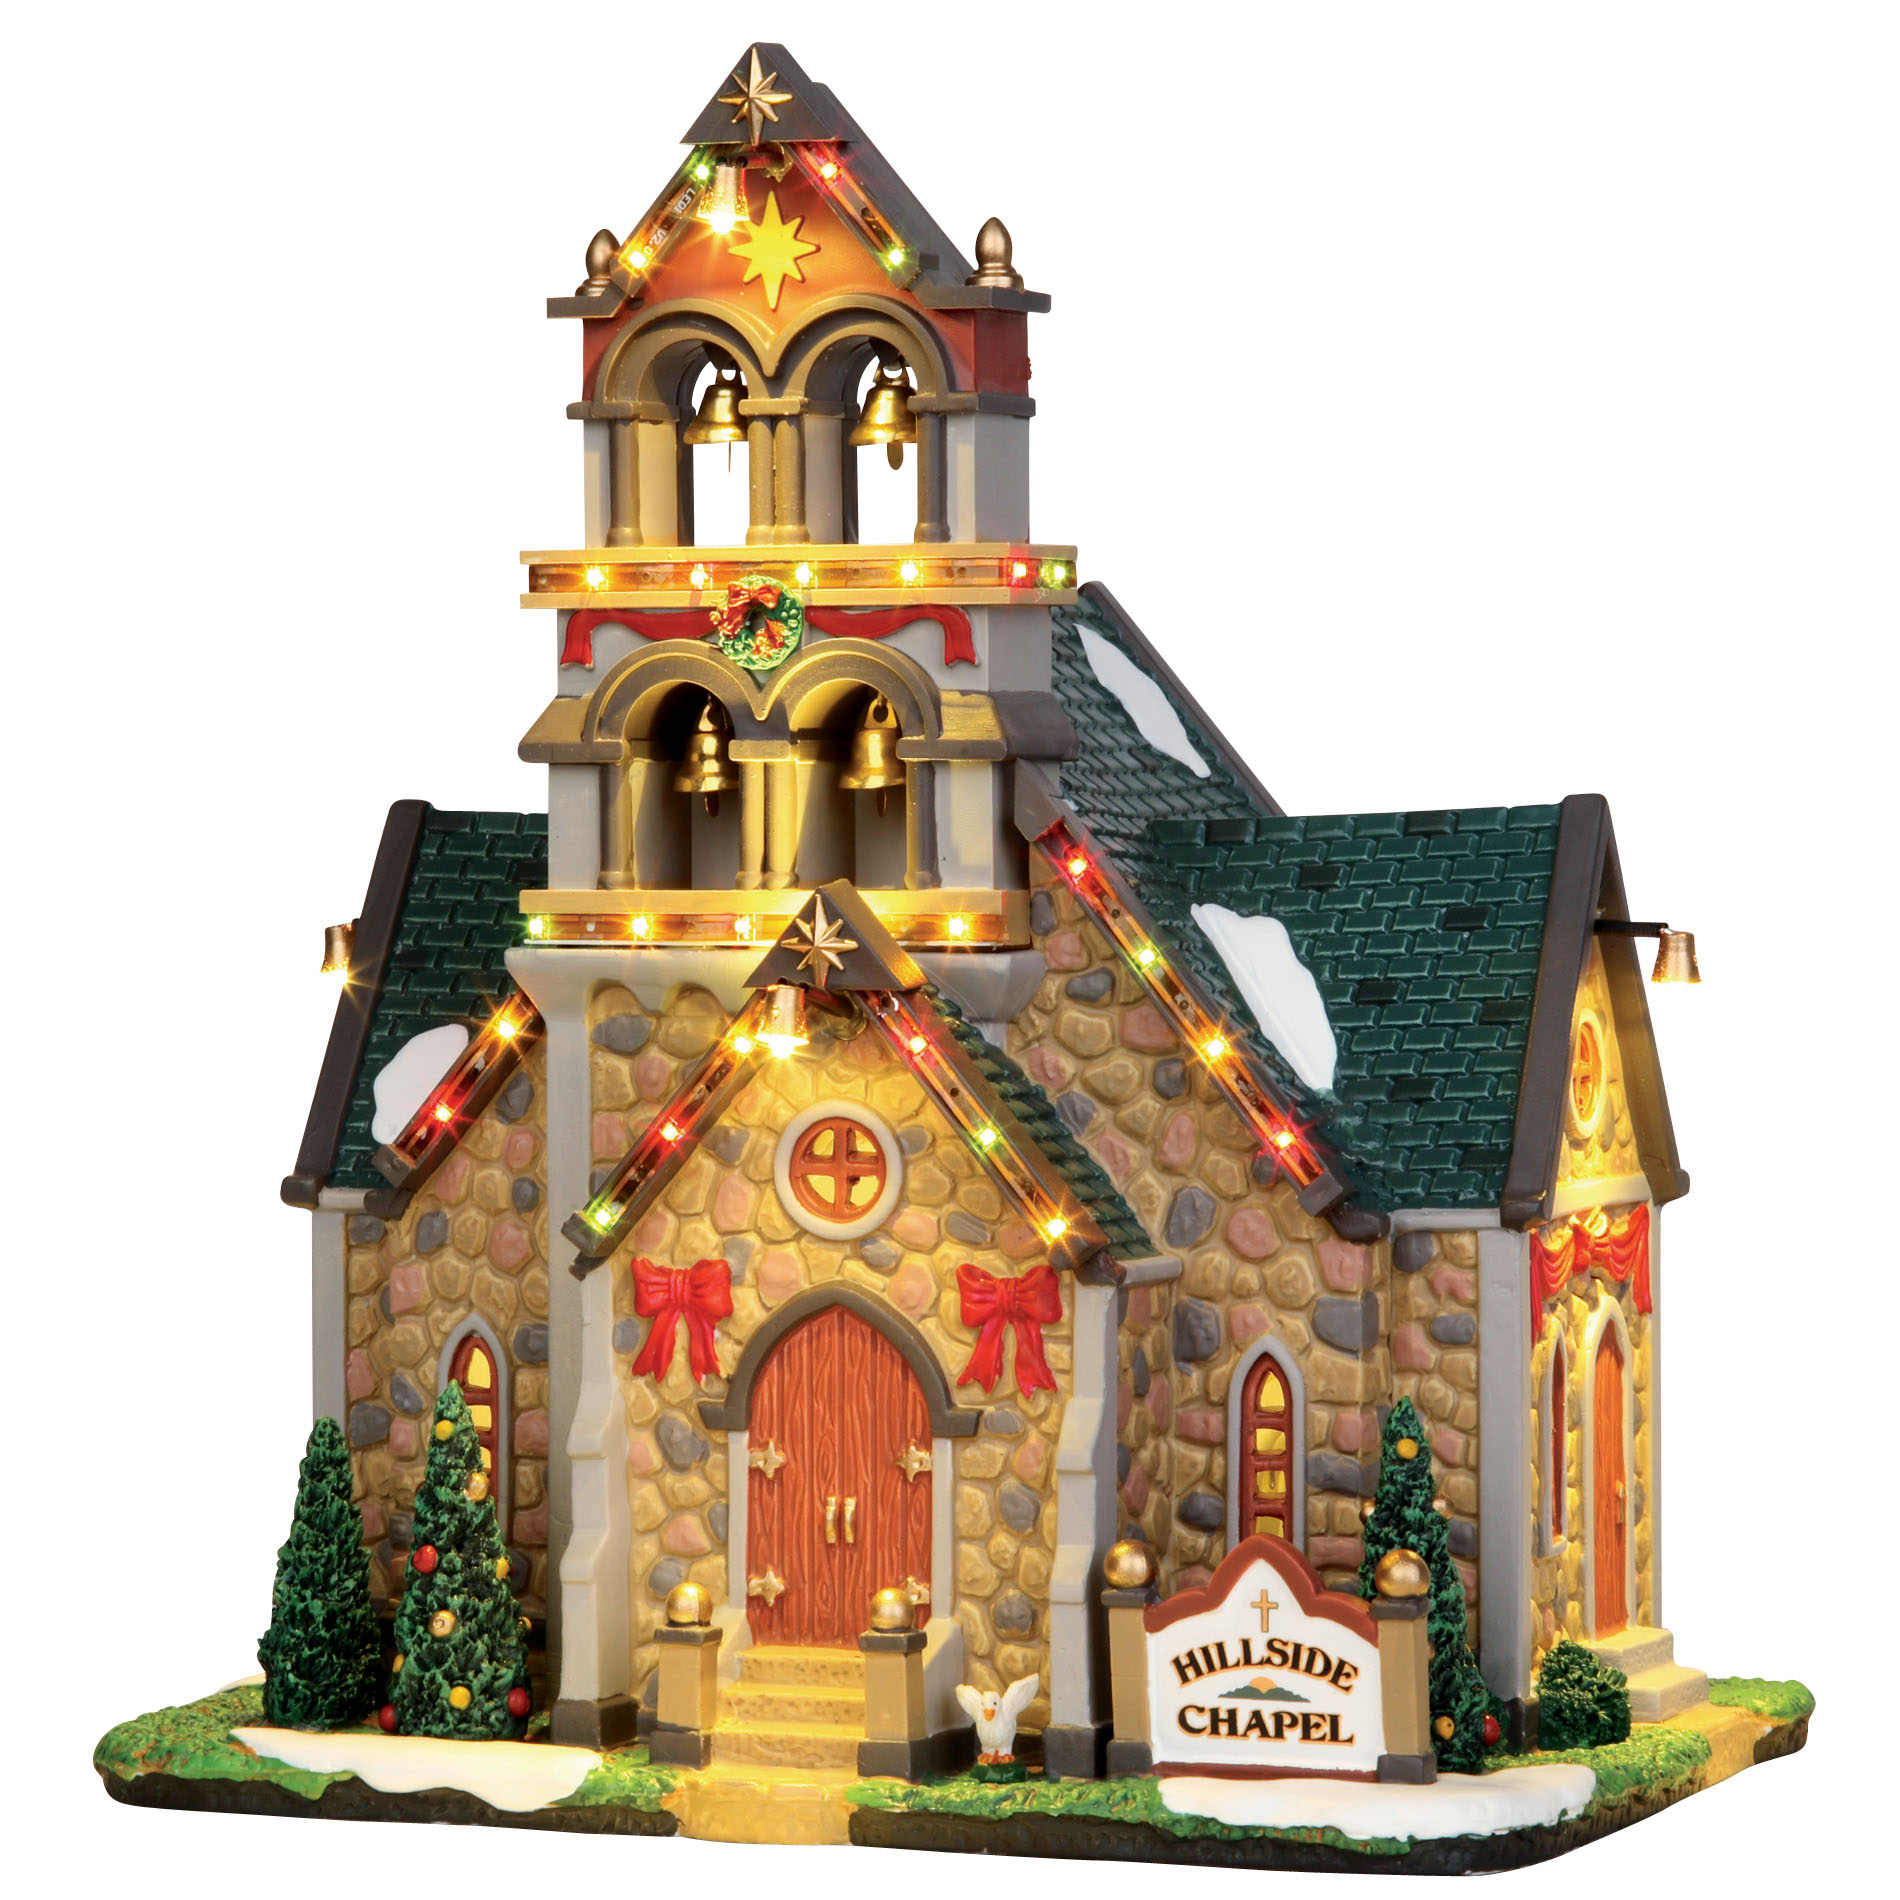 Lemax Village Collection Caddington Hillside Bell Chapel